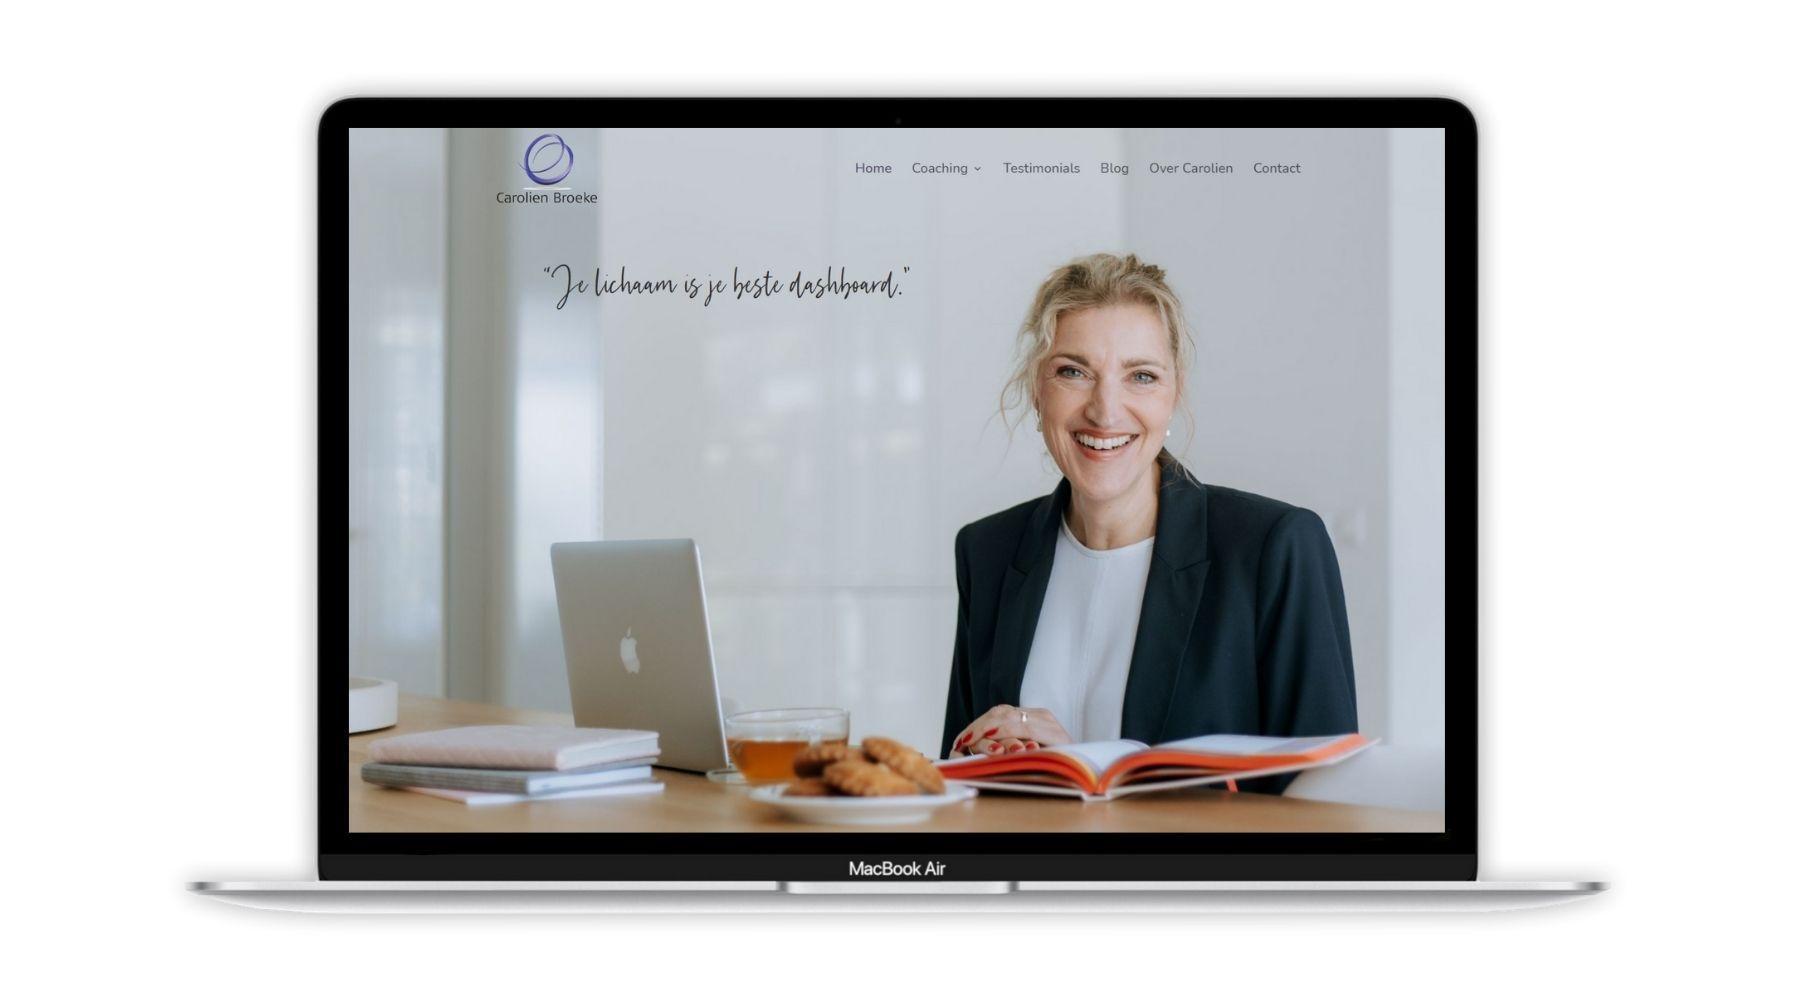 Portfolio Website Carolien Broeke Paula Terpstra Webdesign 1800x1000